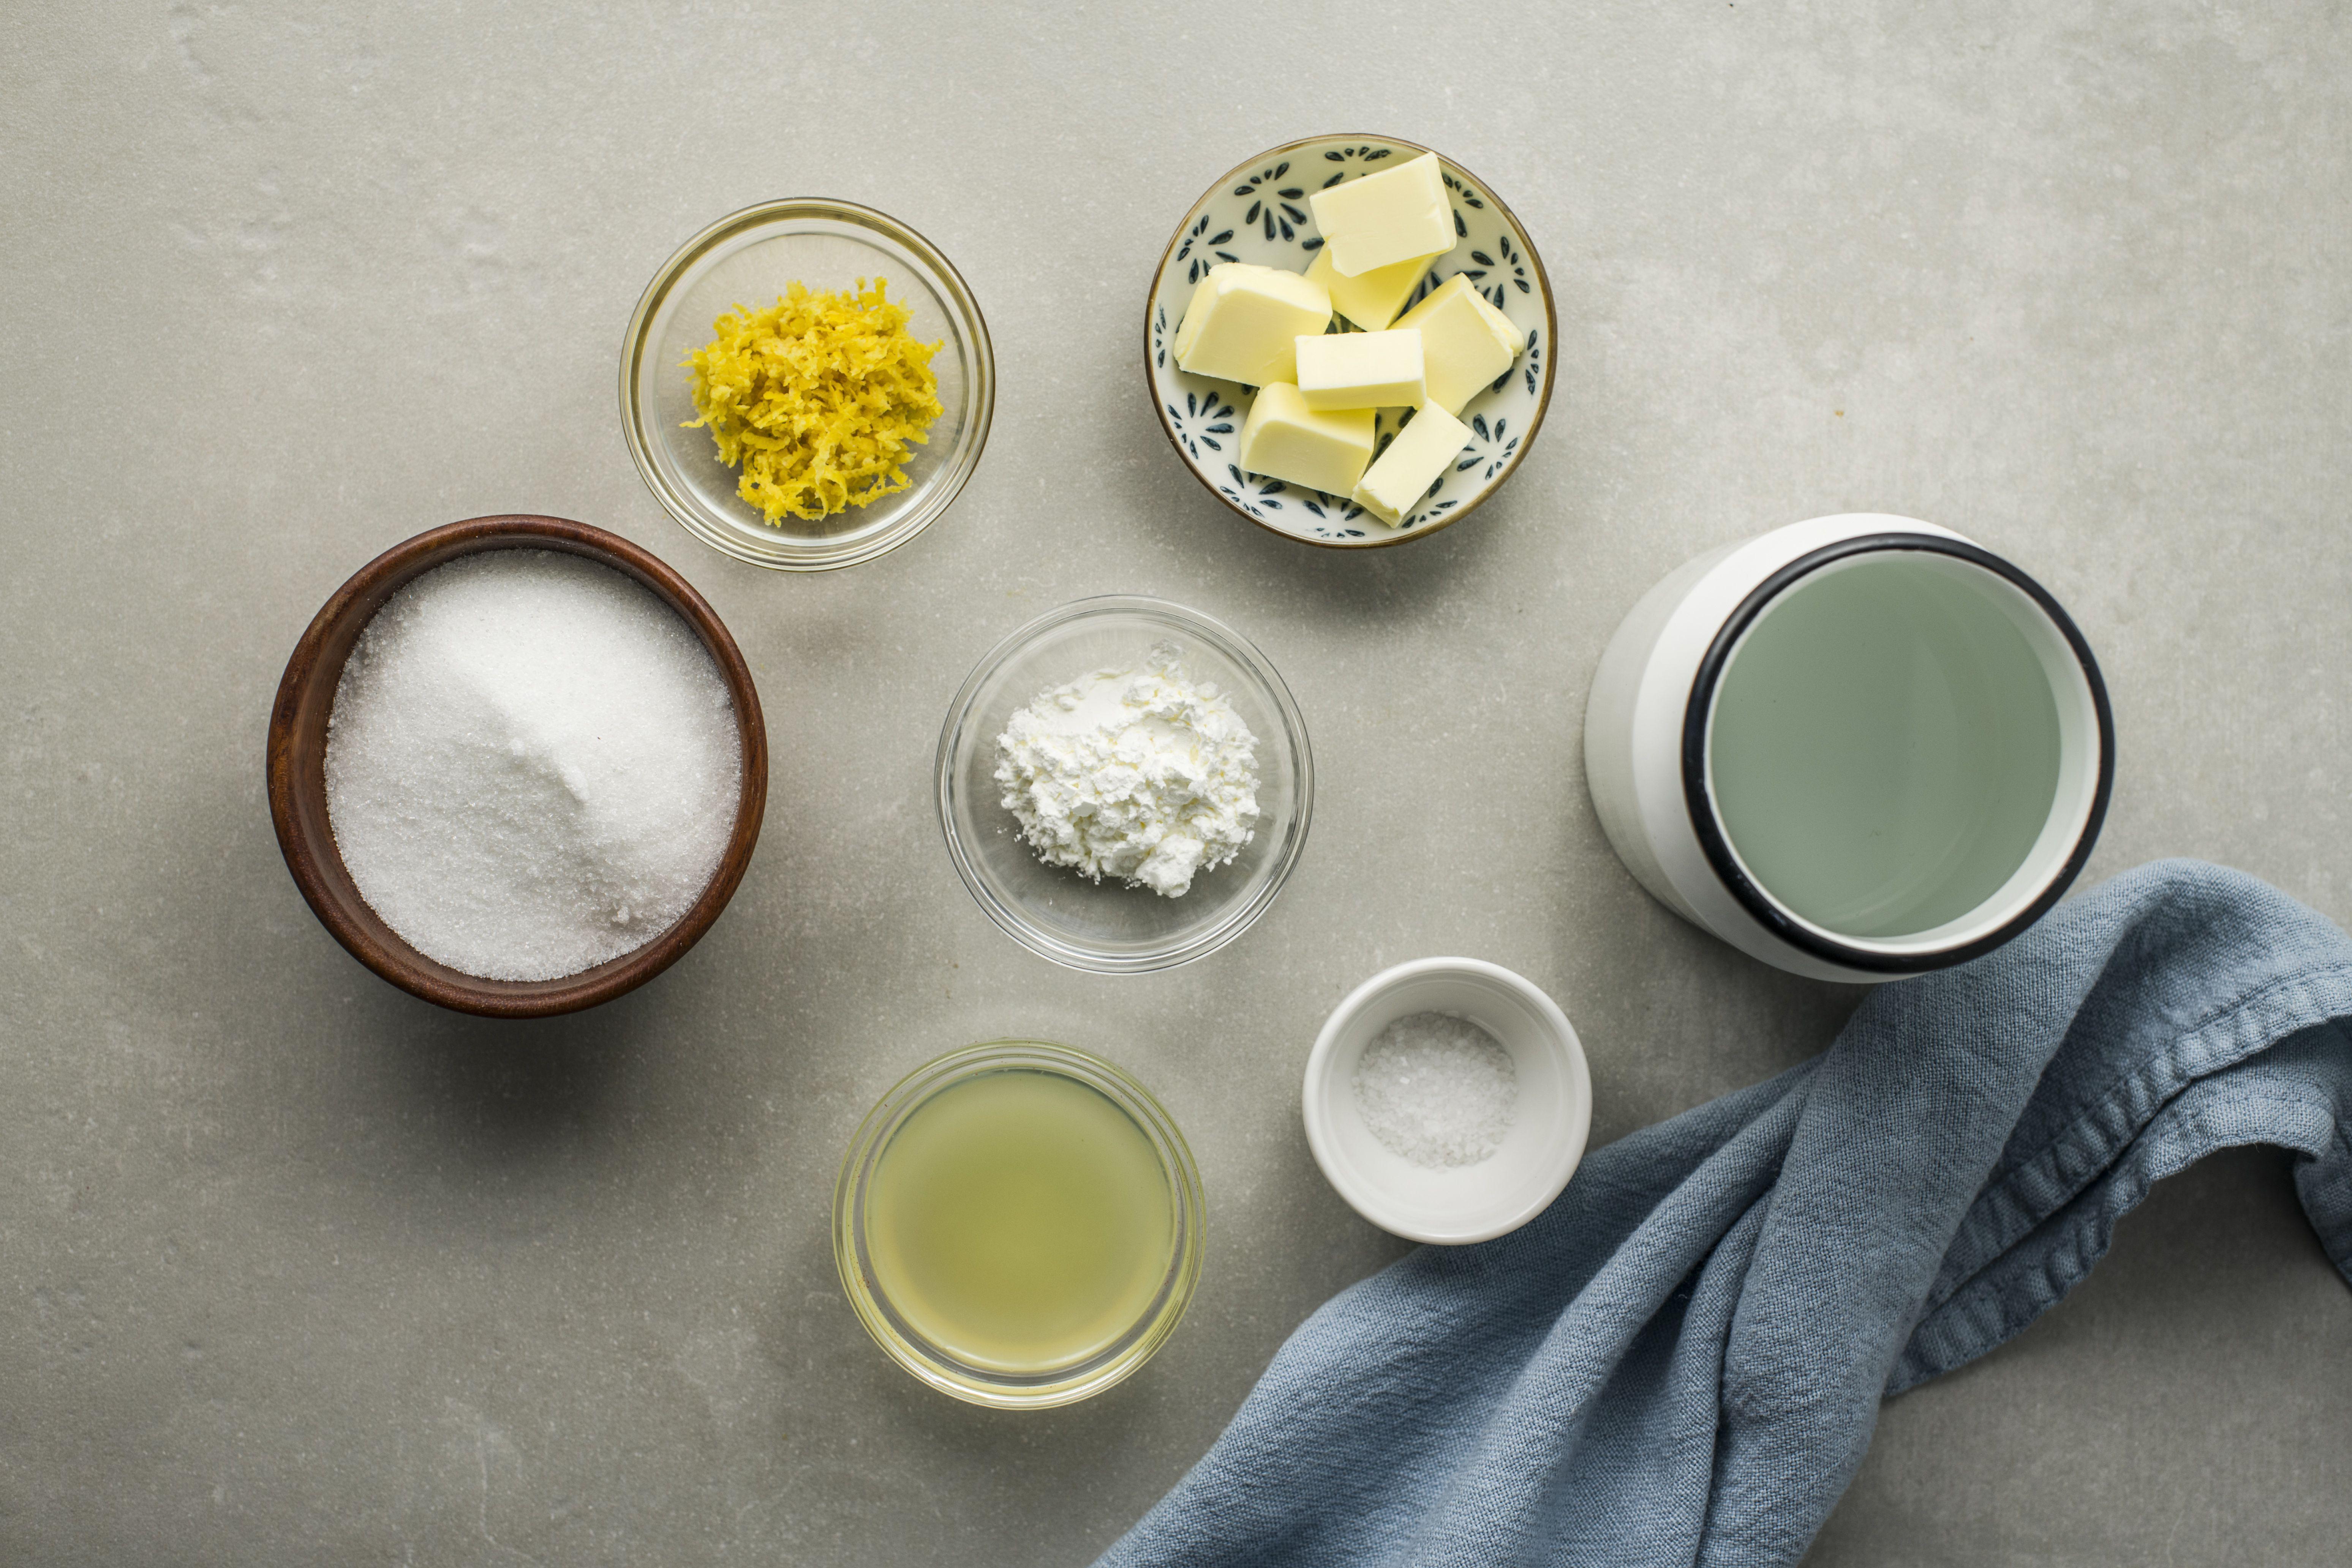 Ingredients for lemon dessert sauce